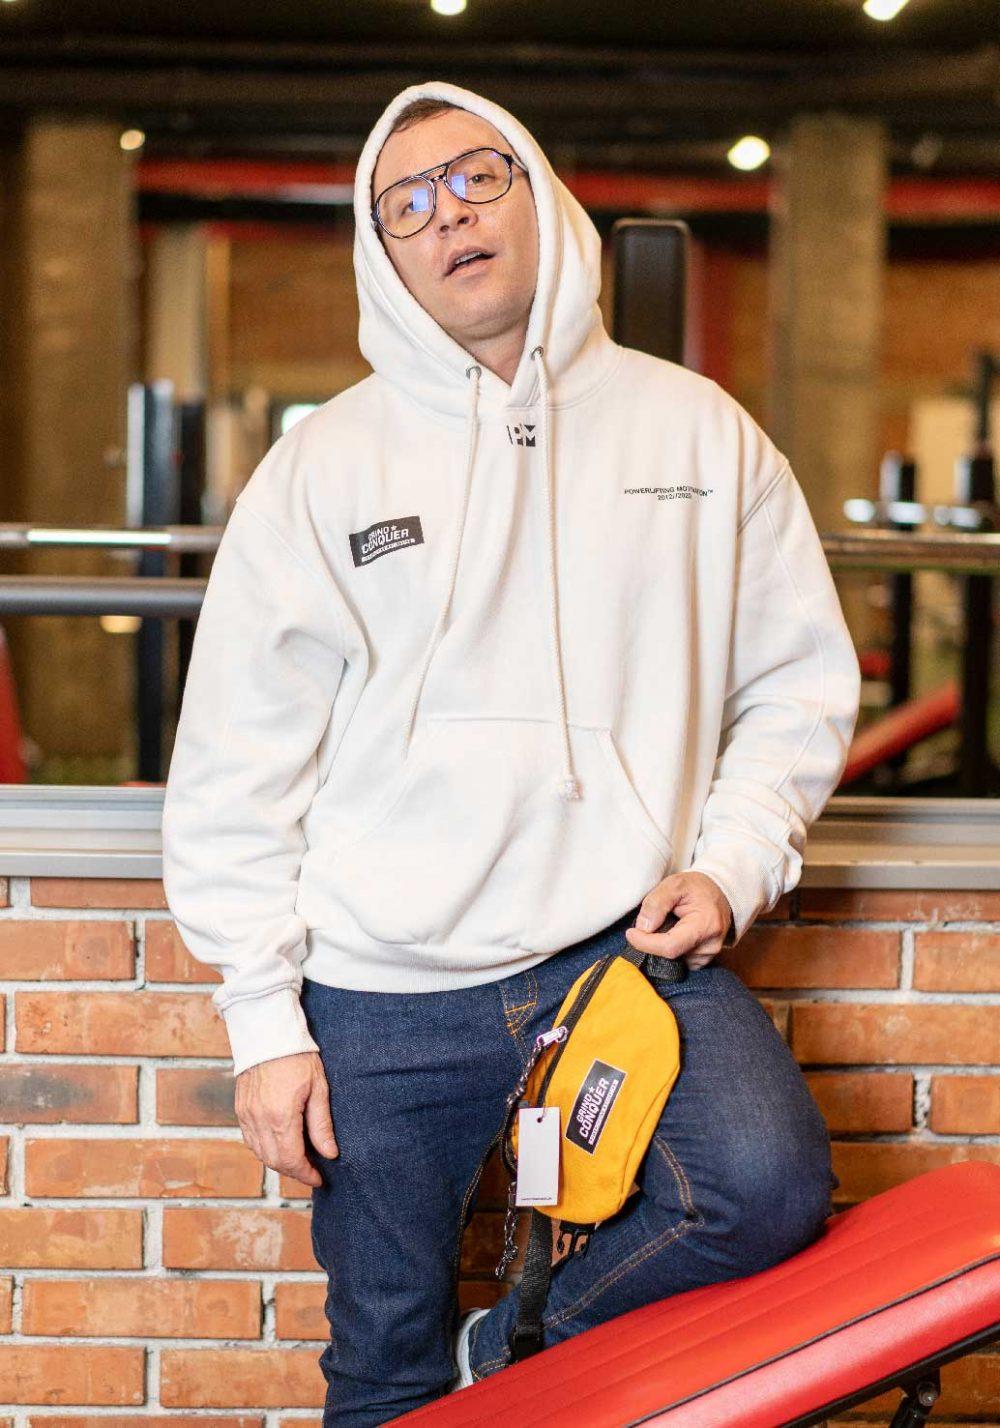 yellow cross body bag PM fanny pack